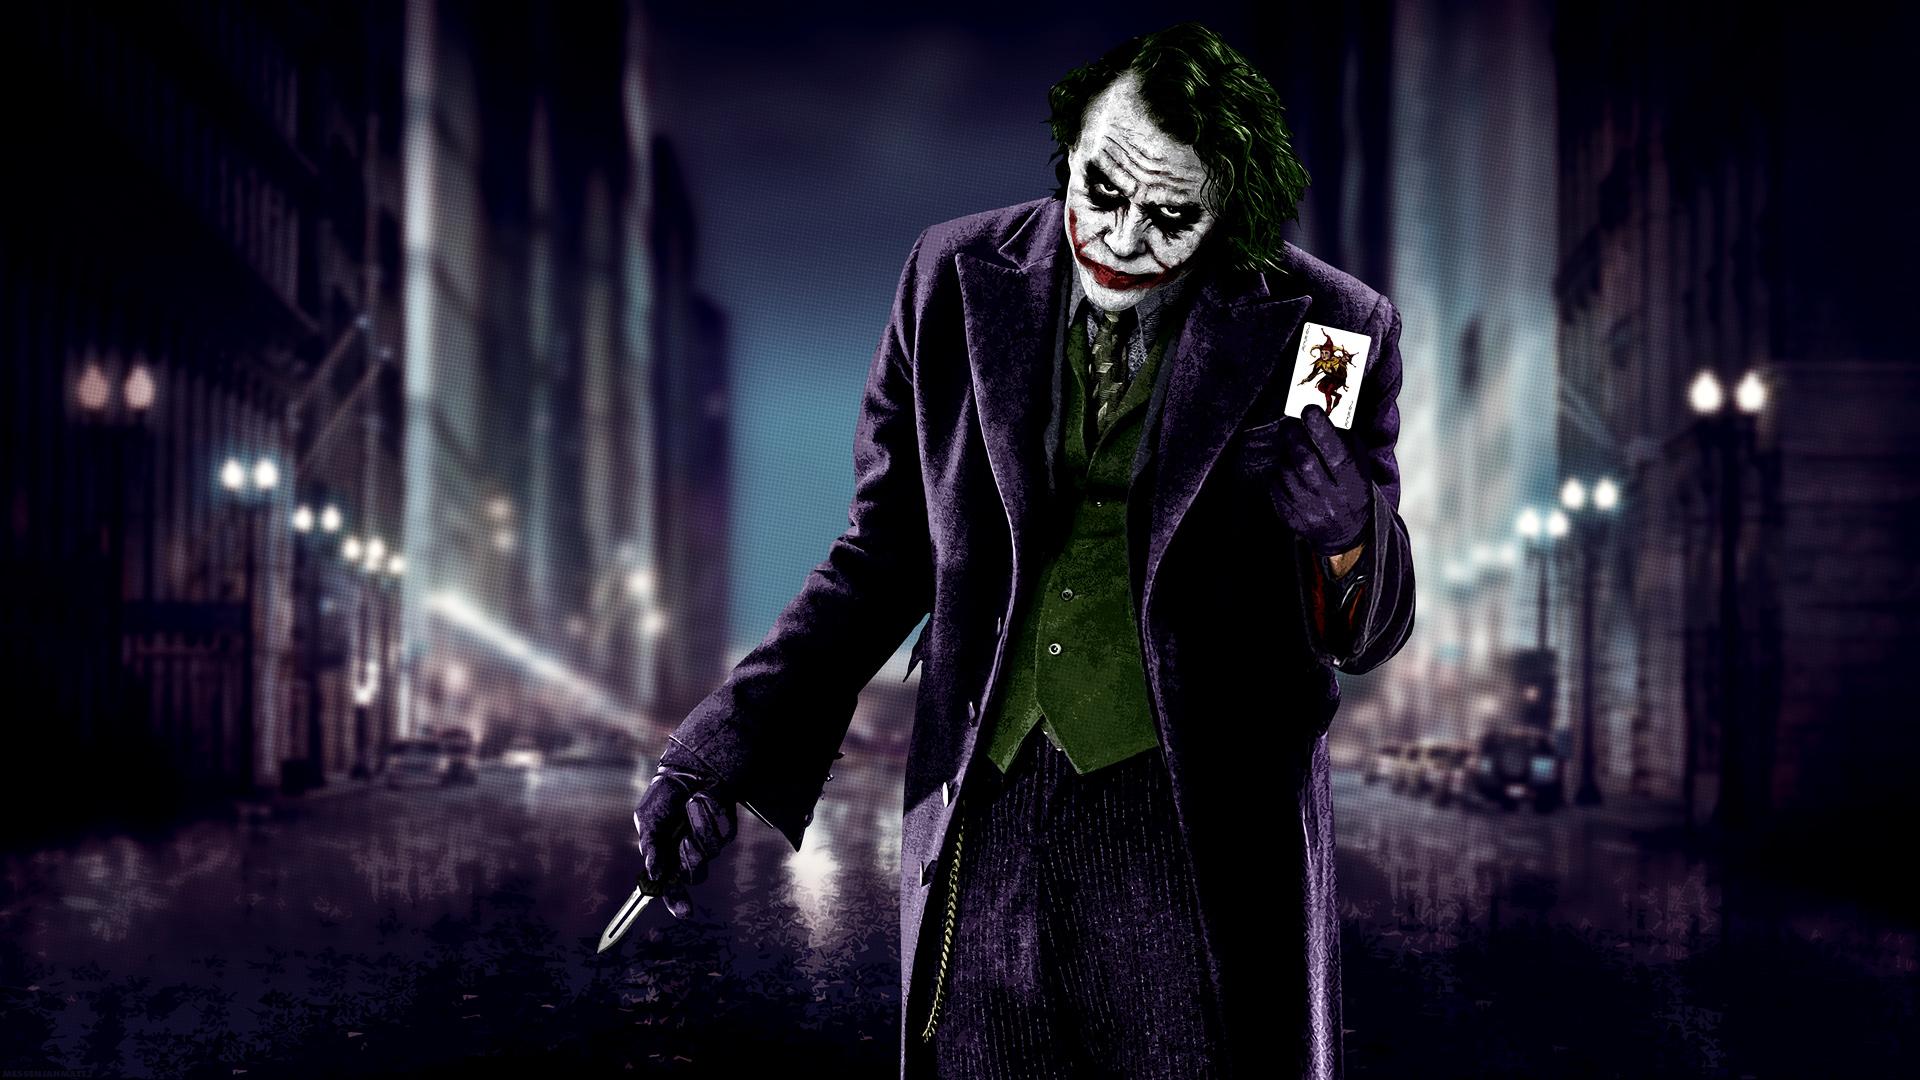 Joker wallpapers Joker background   Page 2 1920x1080